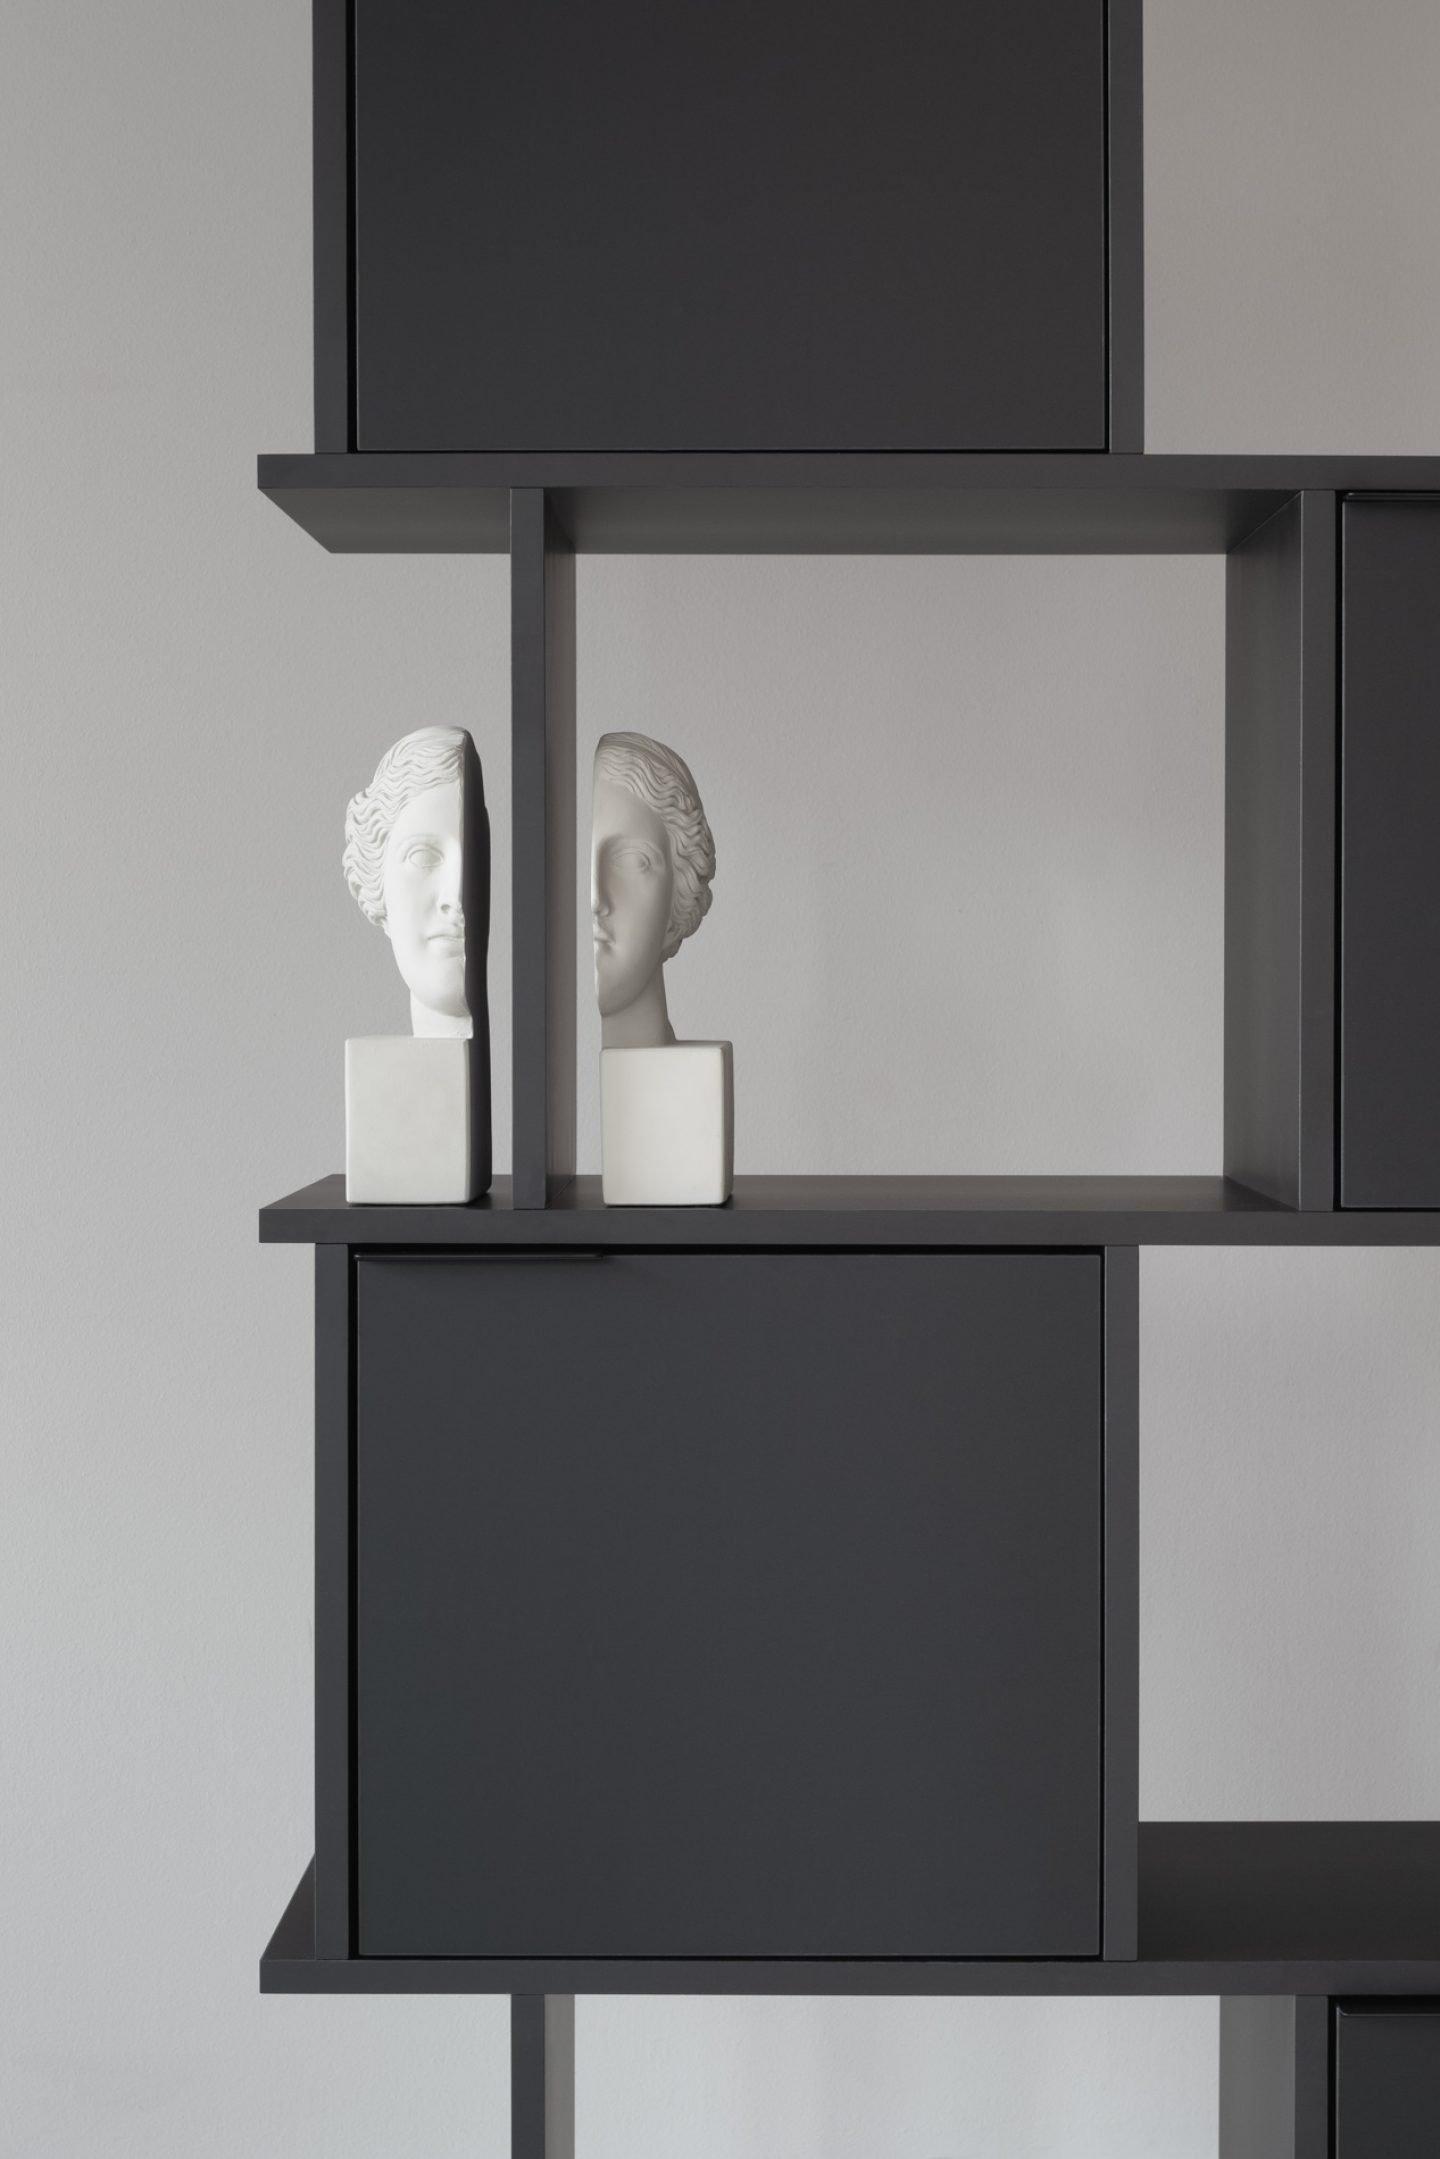 IGNANT-Tylko-shelf-design-Clemens-Poloczek--9